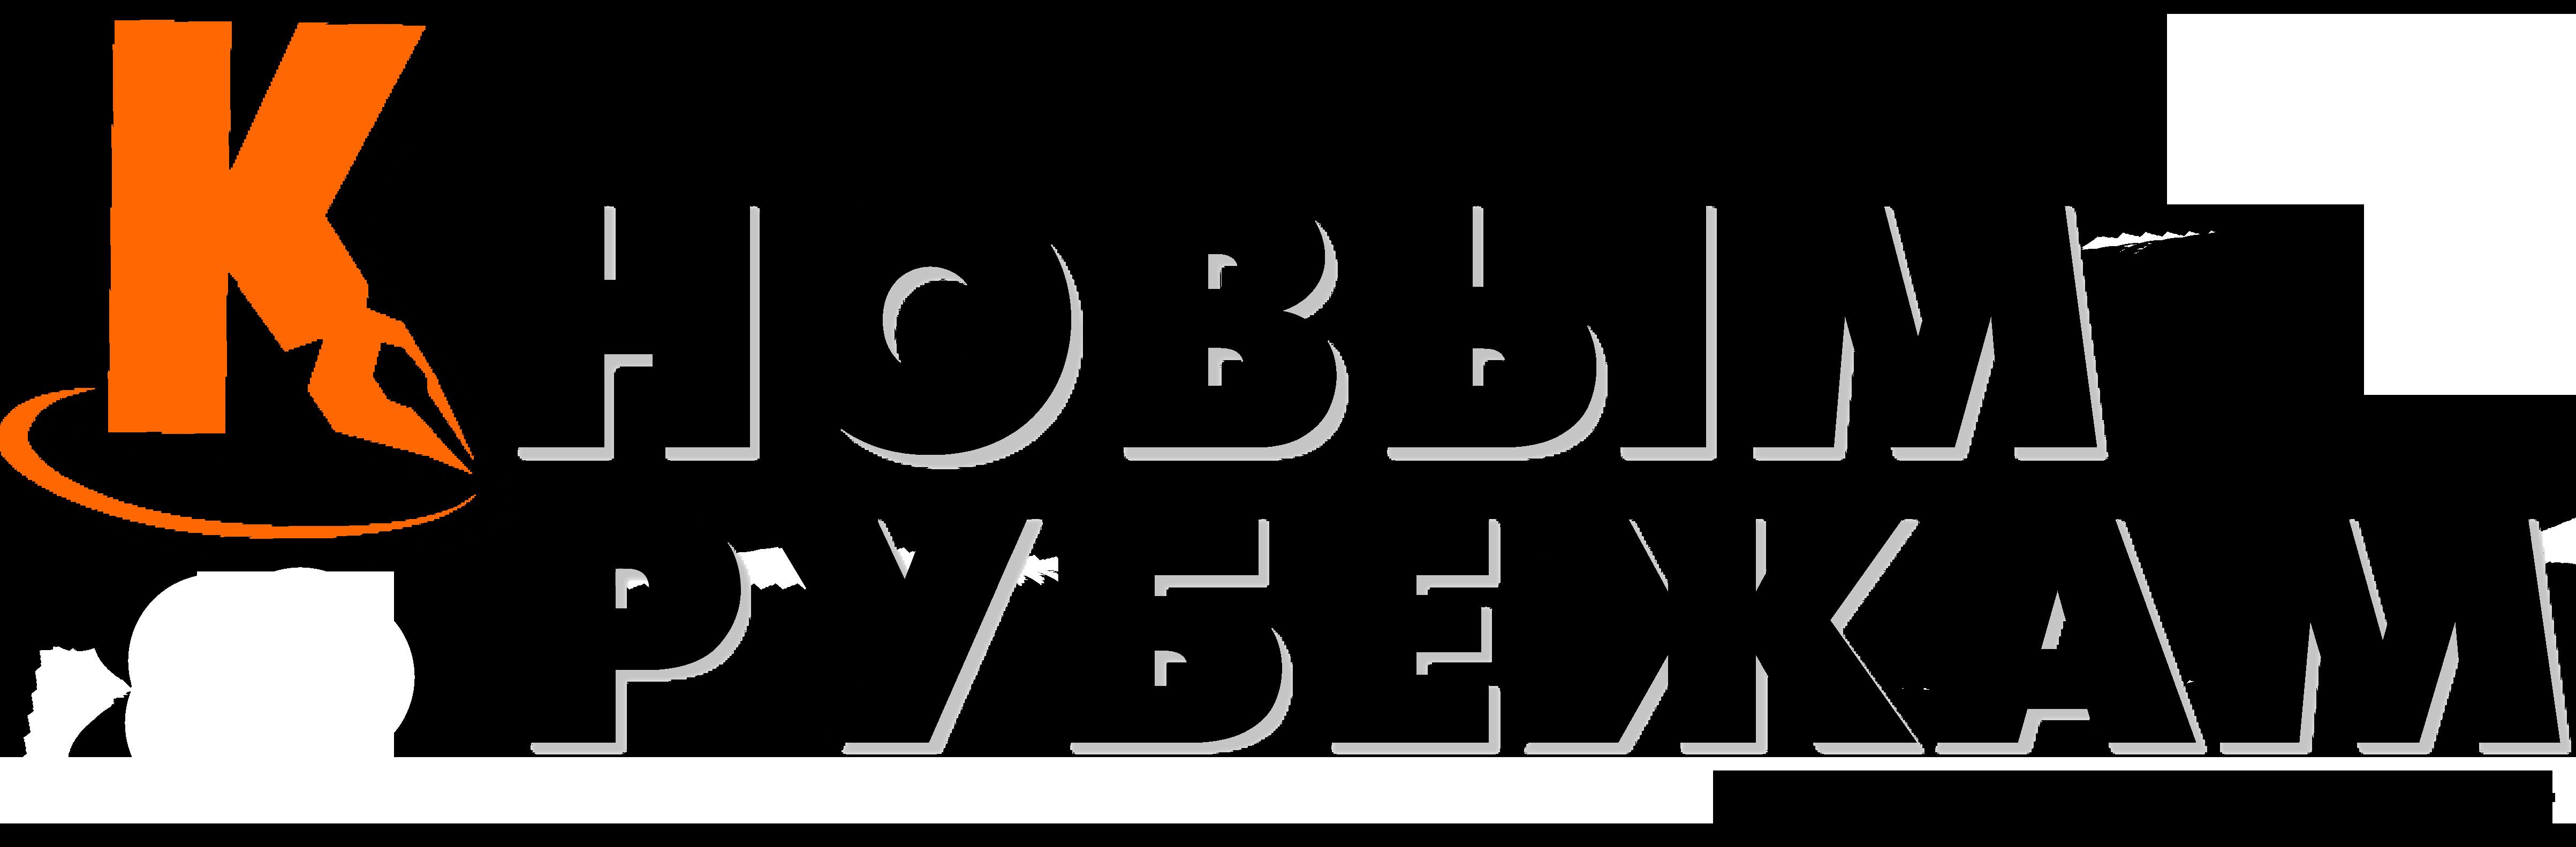 К новым рубежам Logo